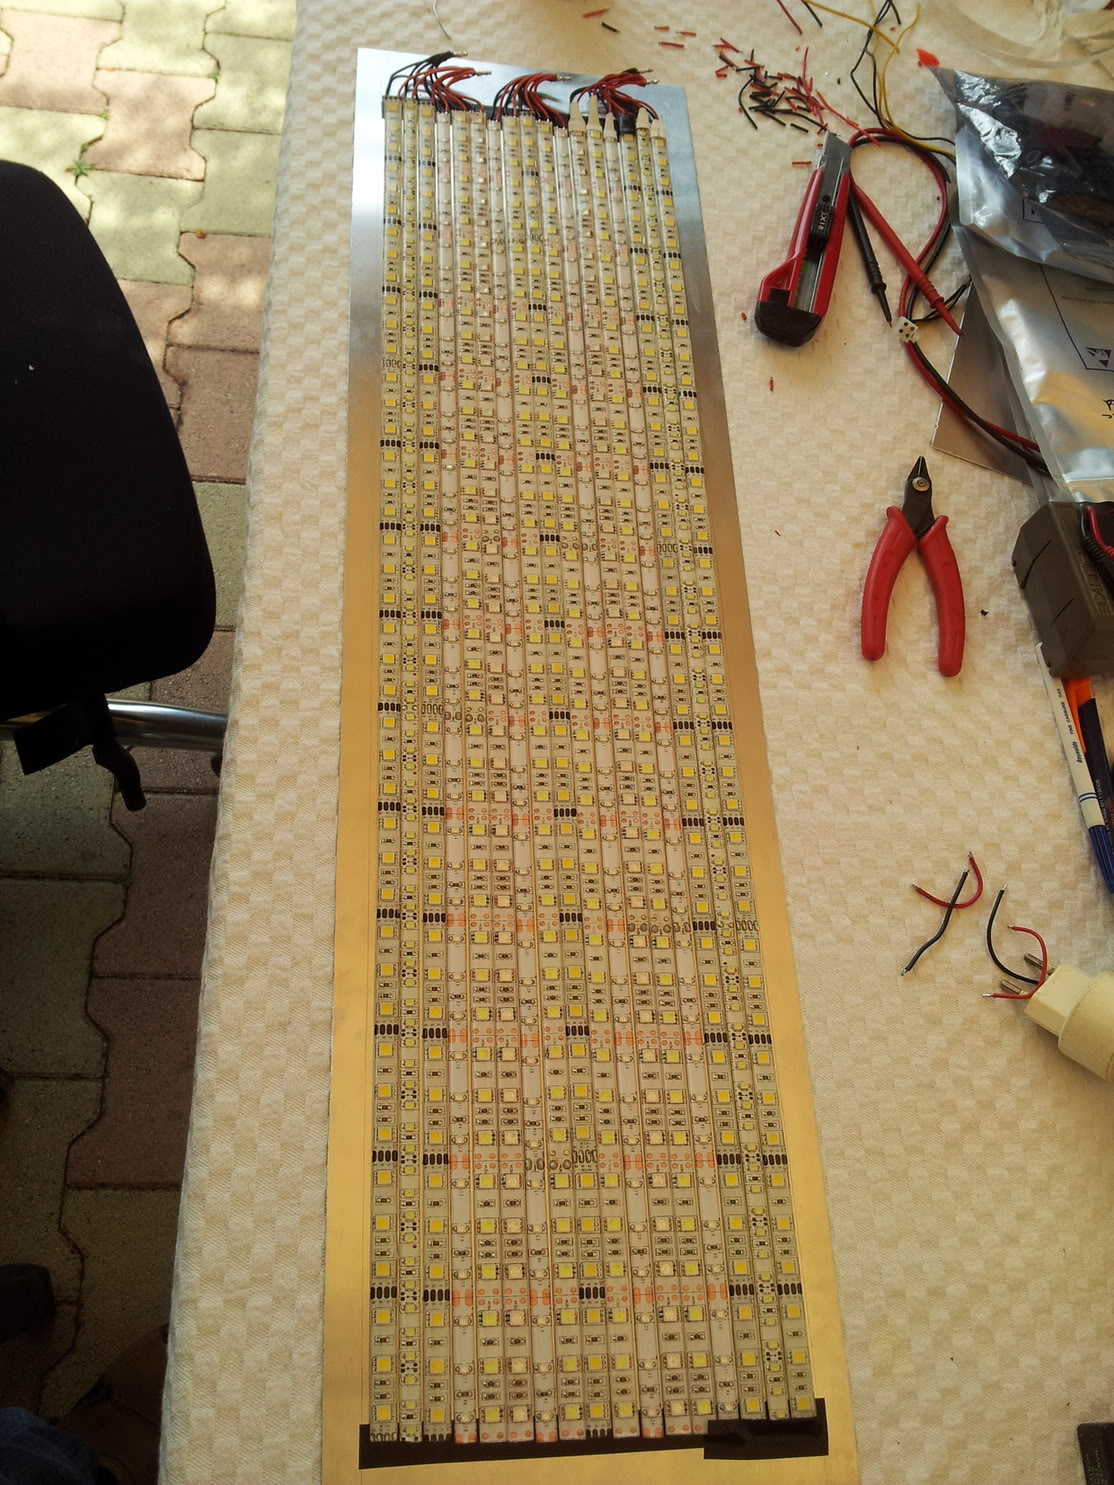 Fabrication galerie LED pour Juwel rio 125 (80cmx20cmx1.8cm) 20120714_162809